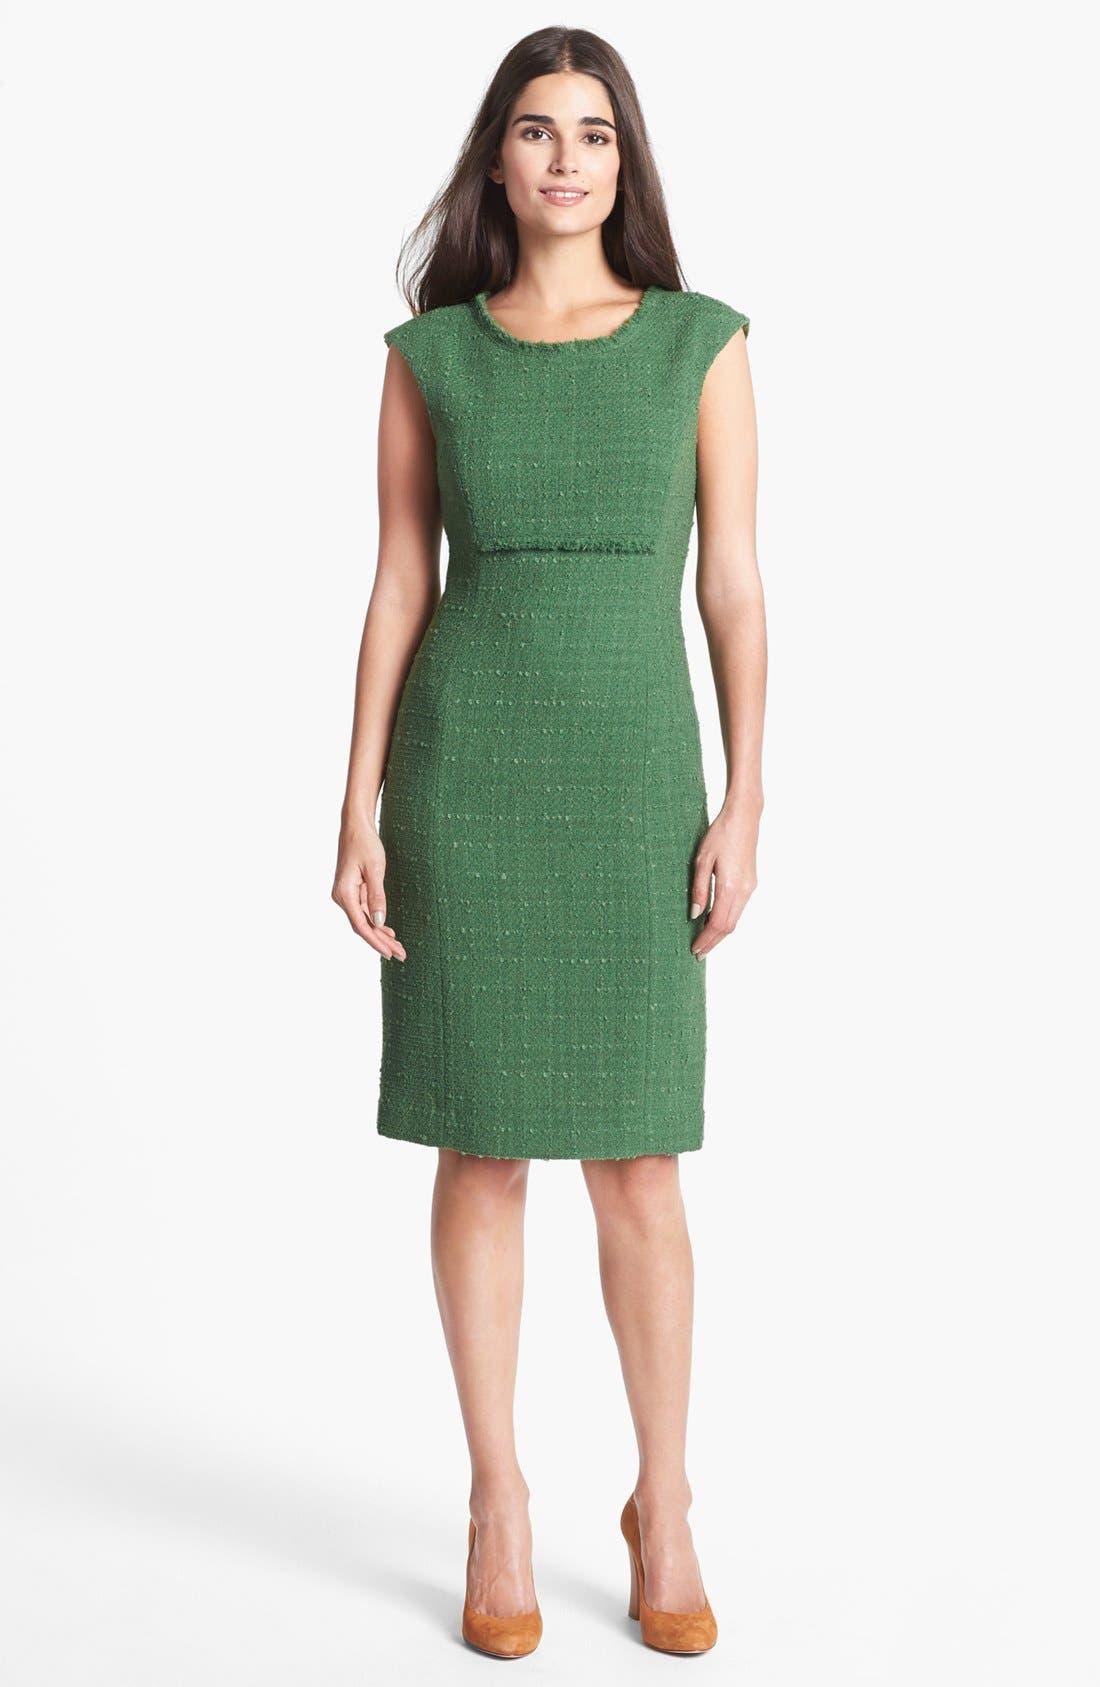 Main Image - Santorelli Tweed Sheath Dress